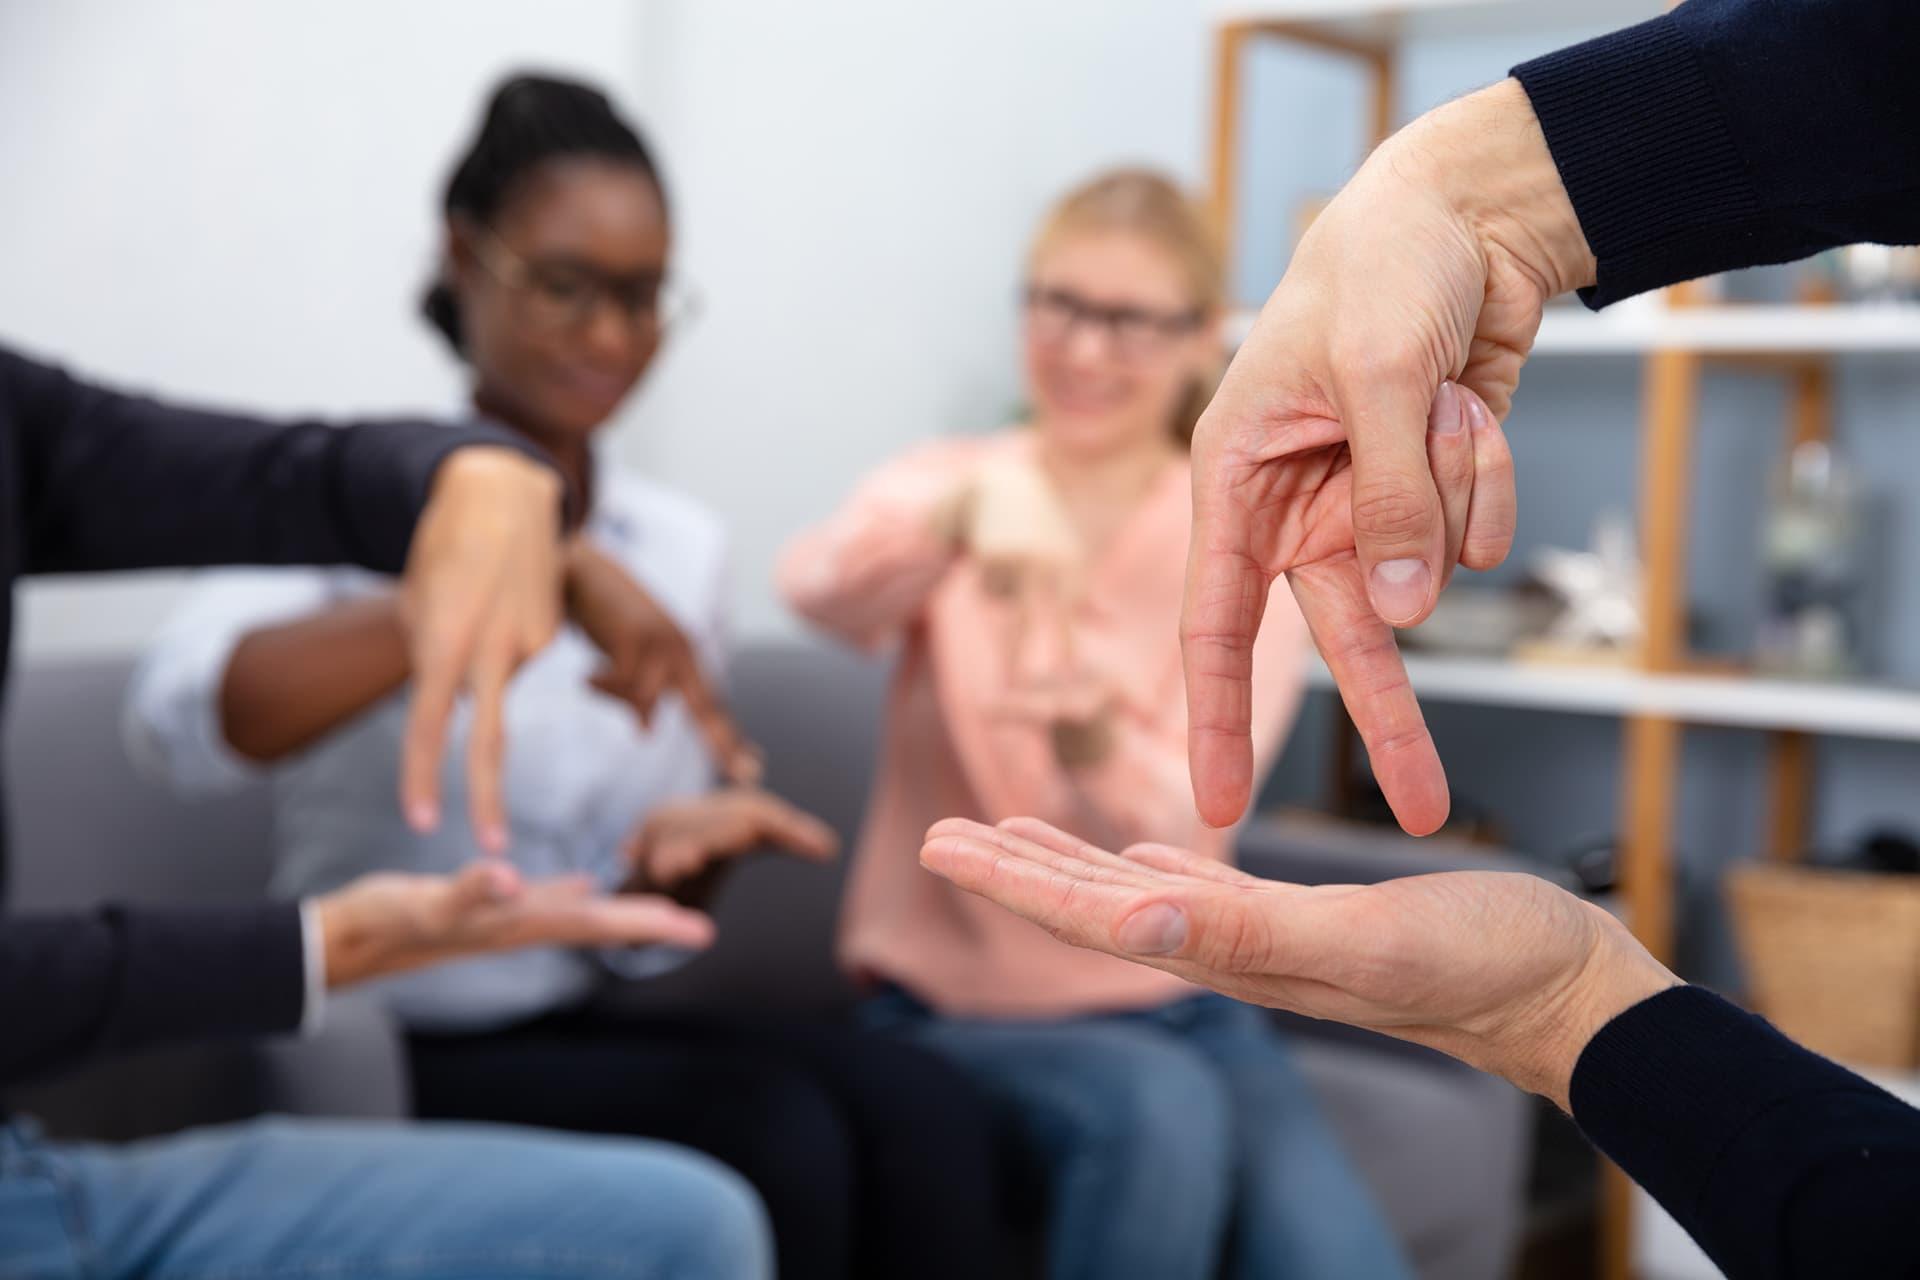 Sign language photo